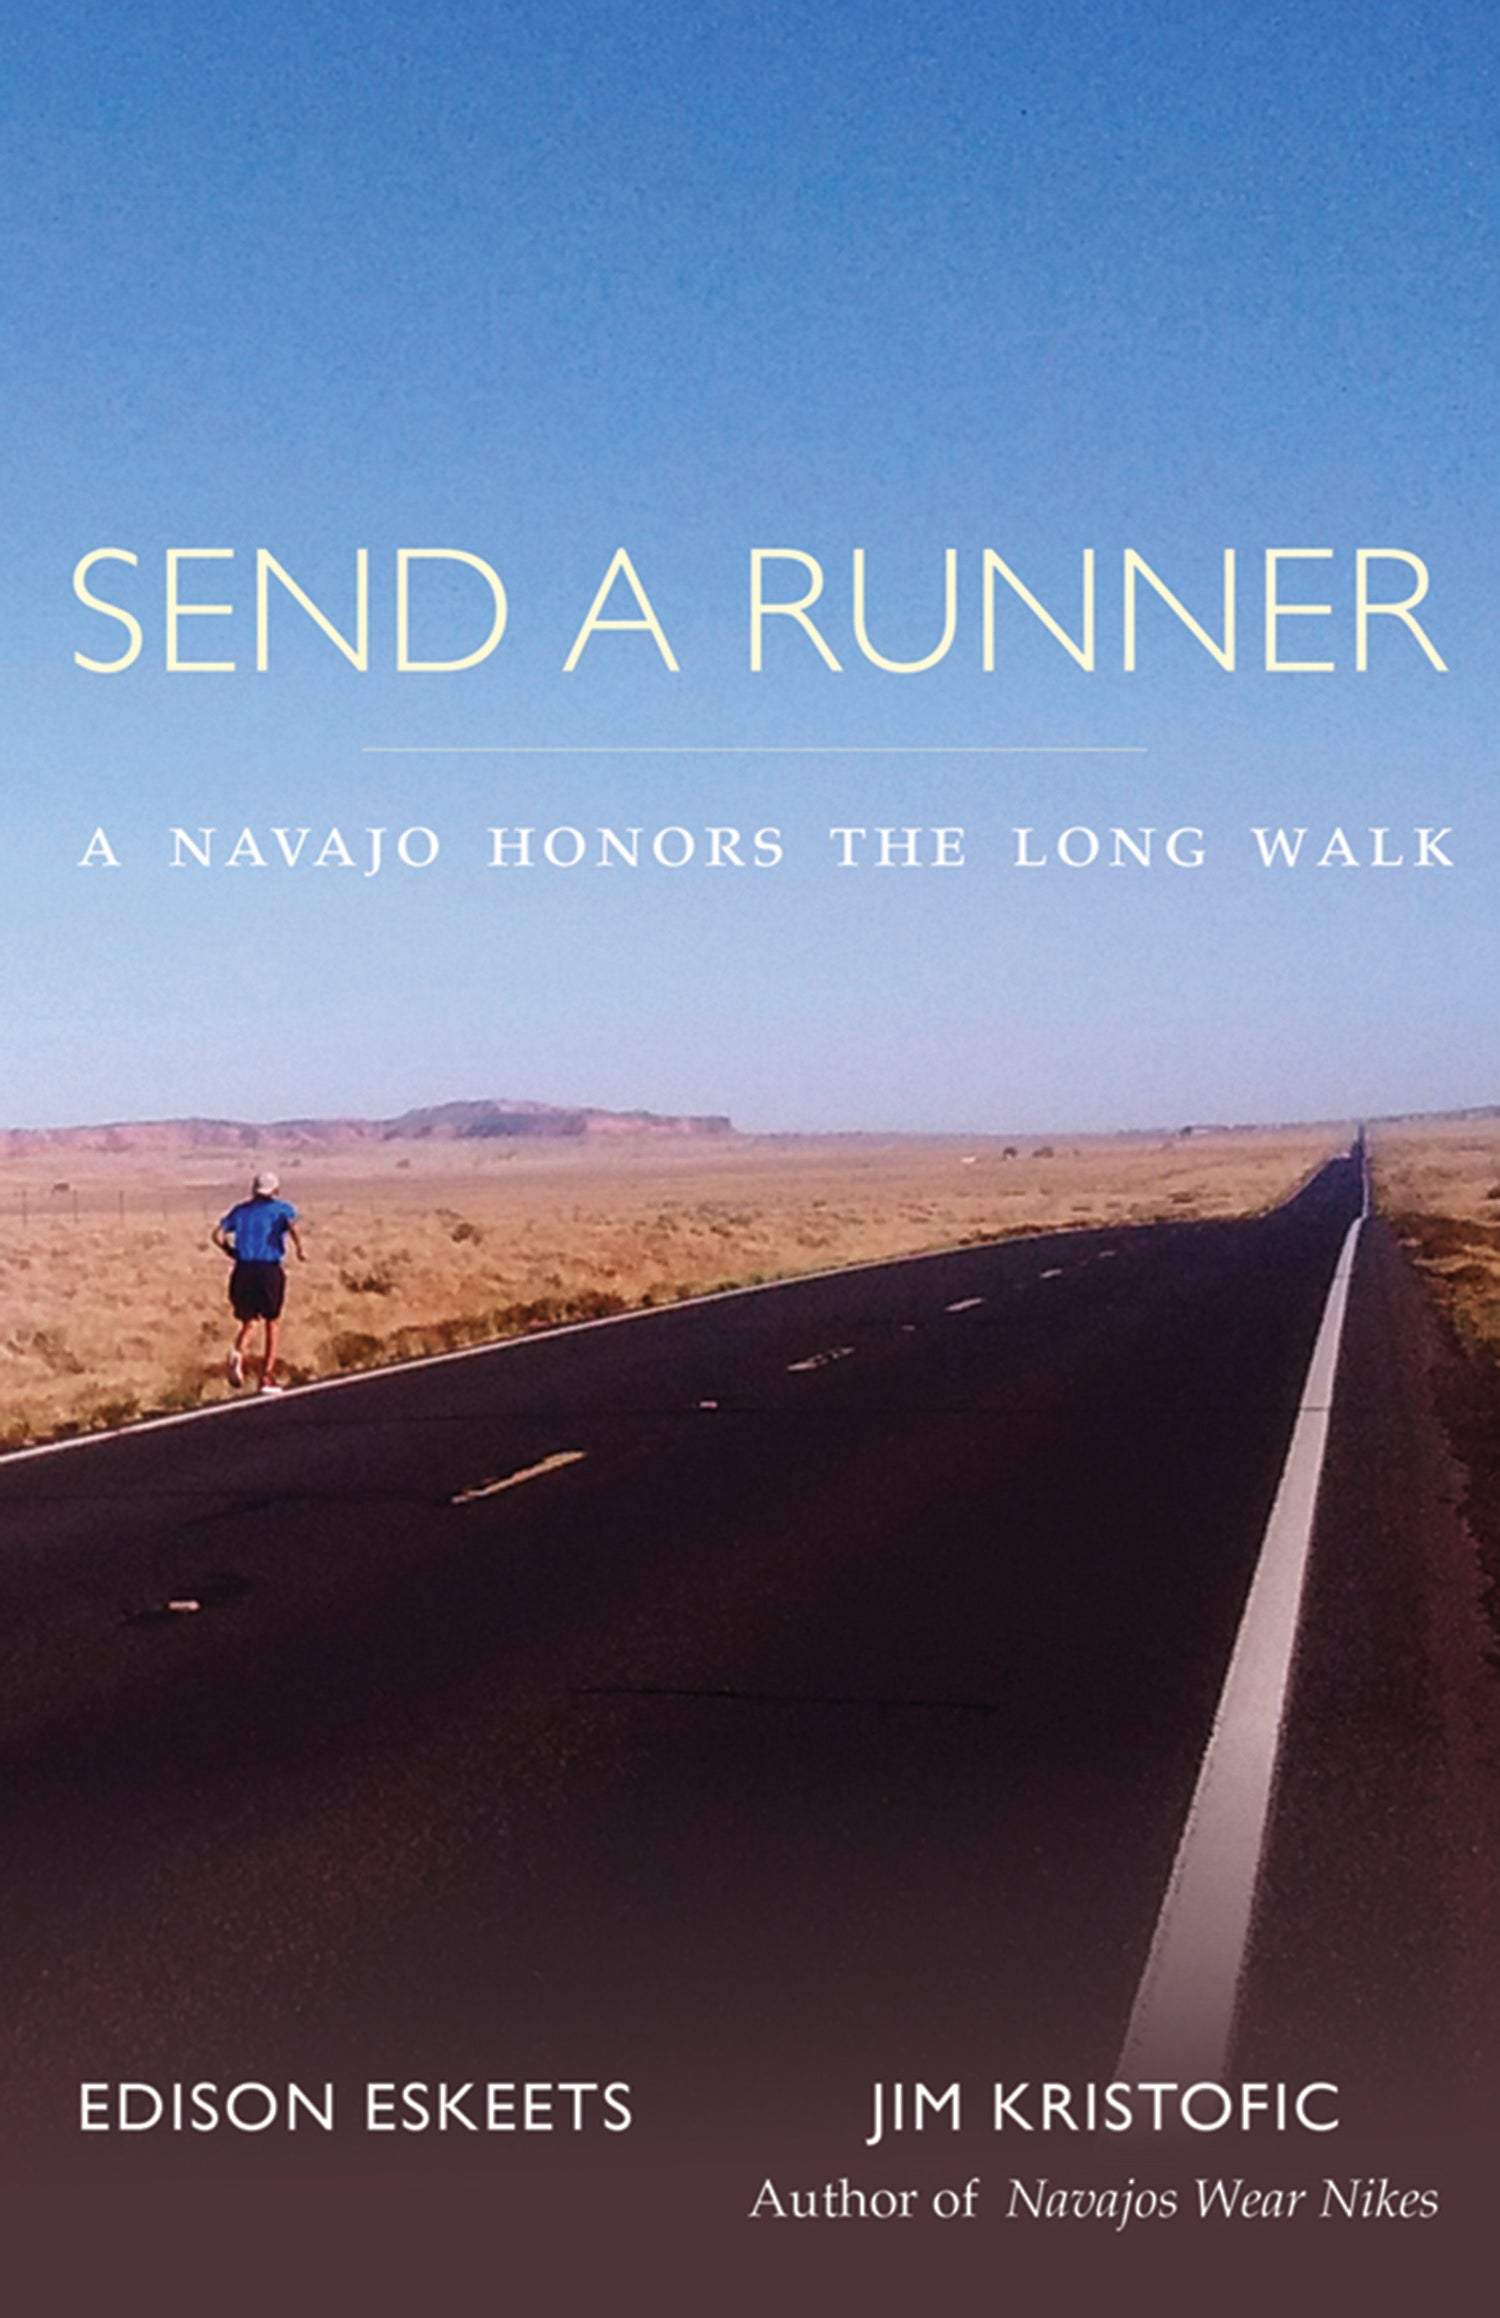 portada del libro de Send a Runner